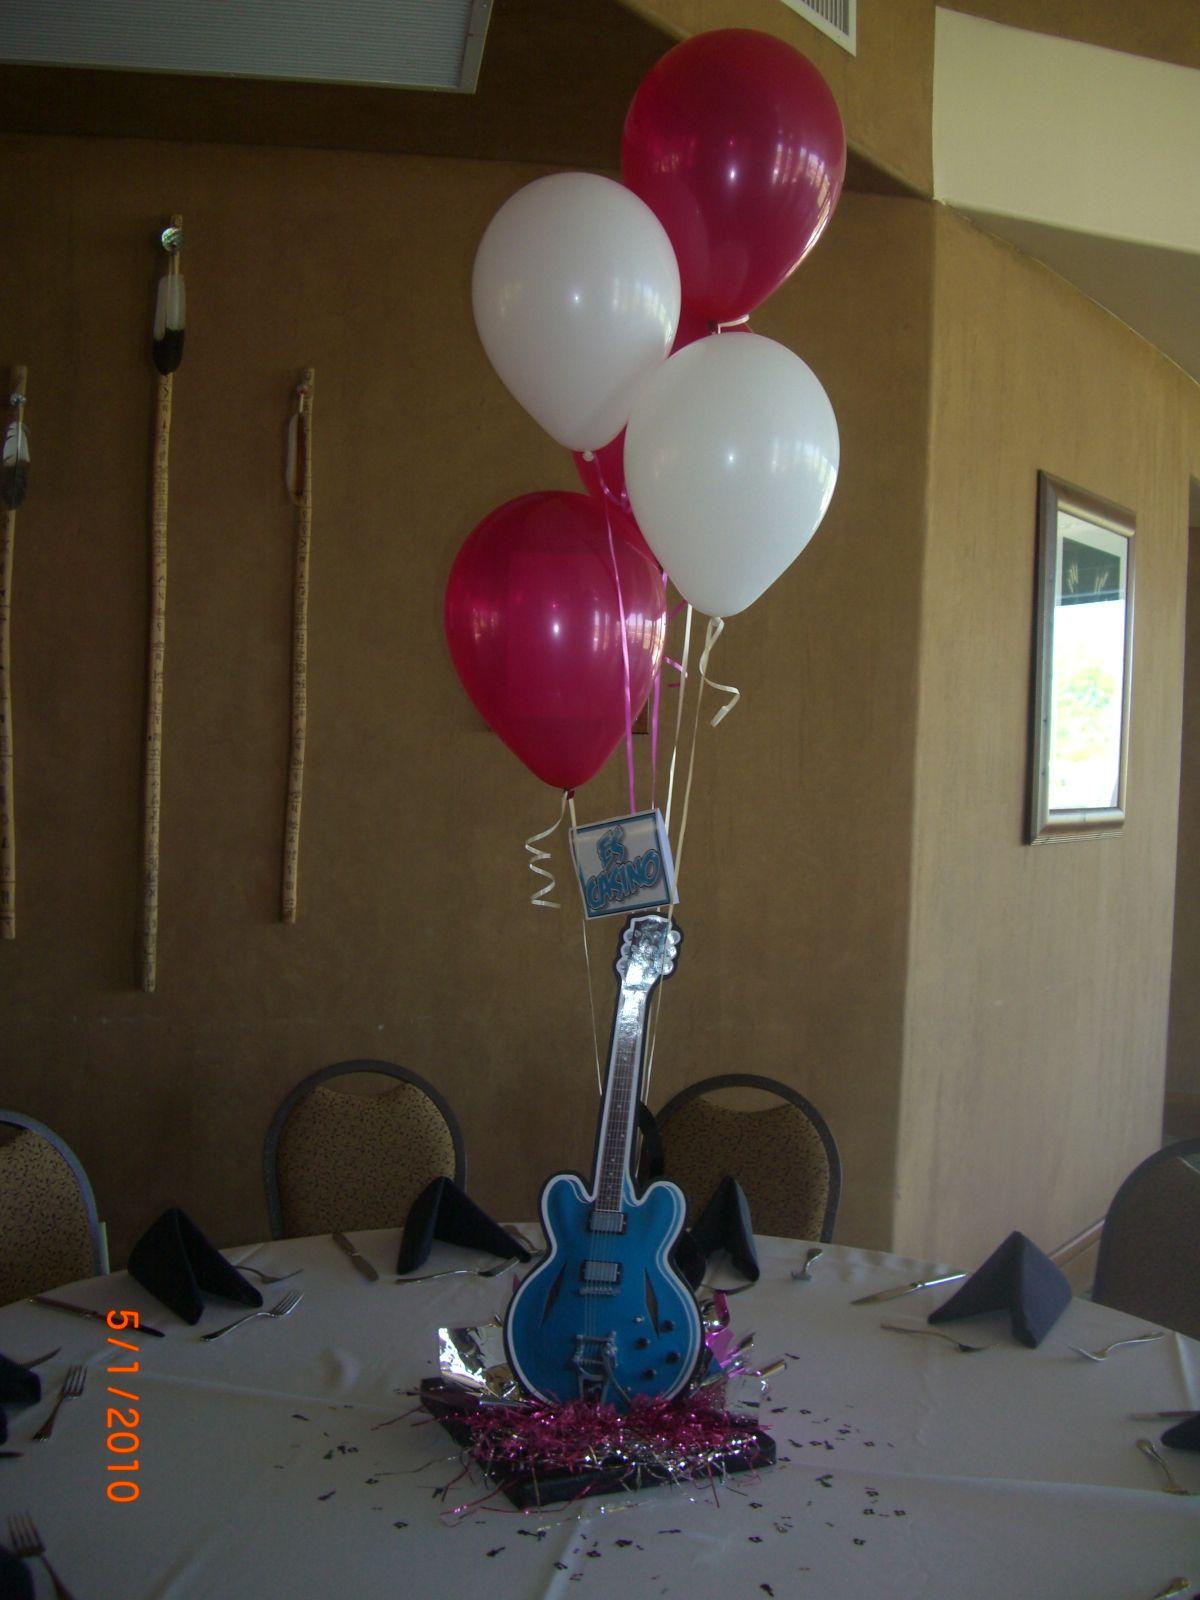 Rock'n Roll centerpiece cute! Music themed parties